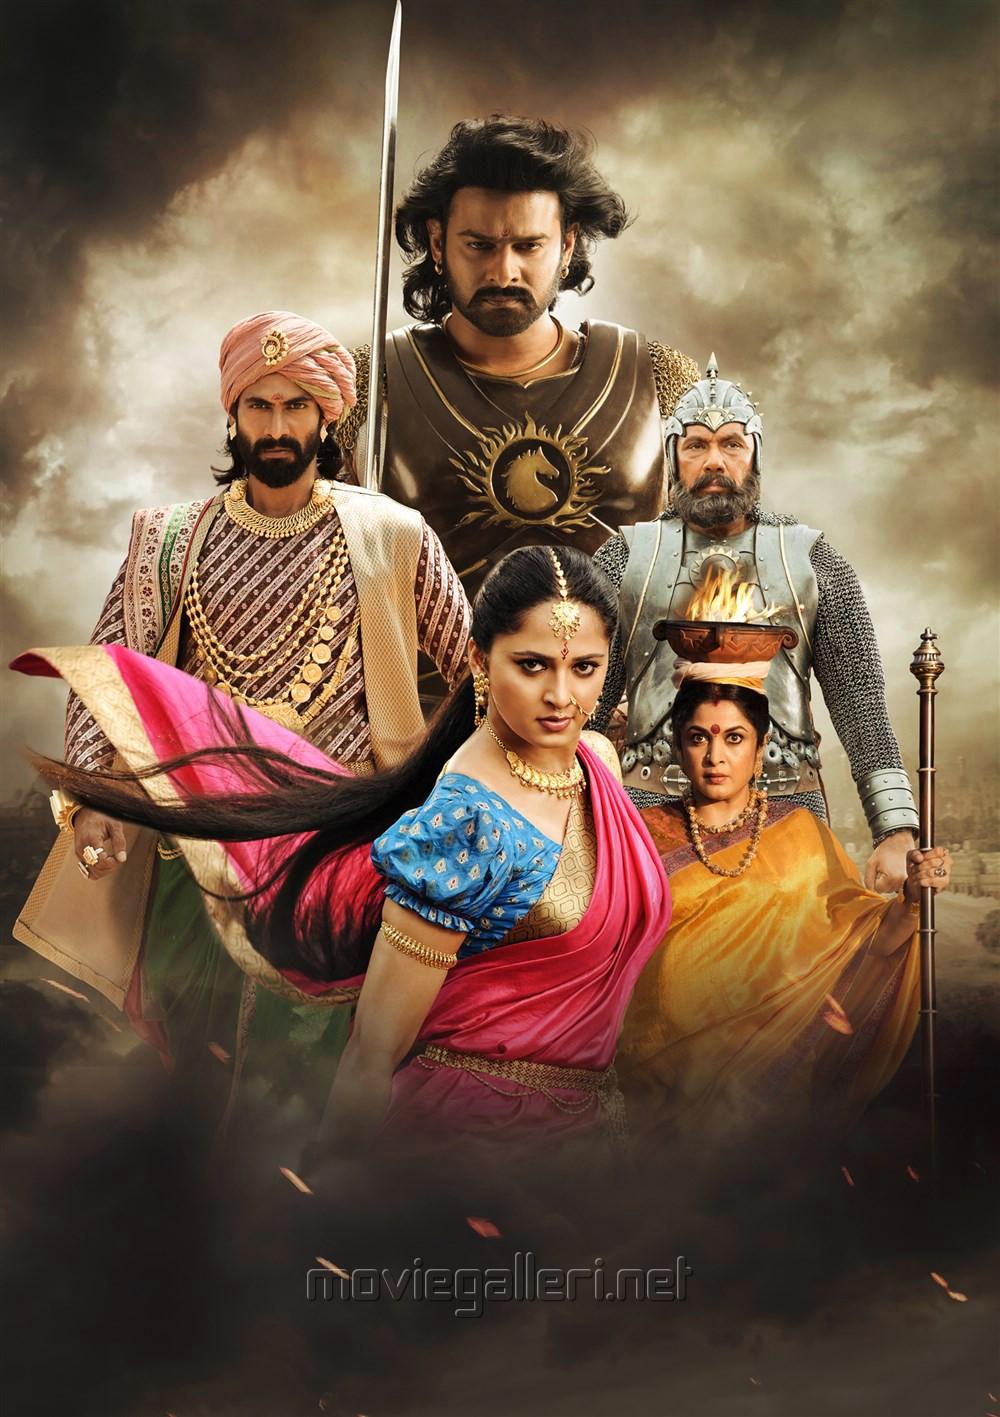 Rana, Prabhas, Anushka, Sathyaraj, Ramya Krishnan in Baahubali 2 New Images HD